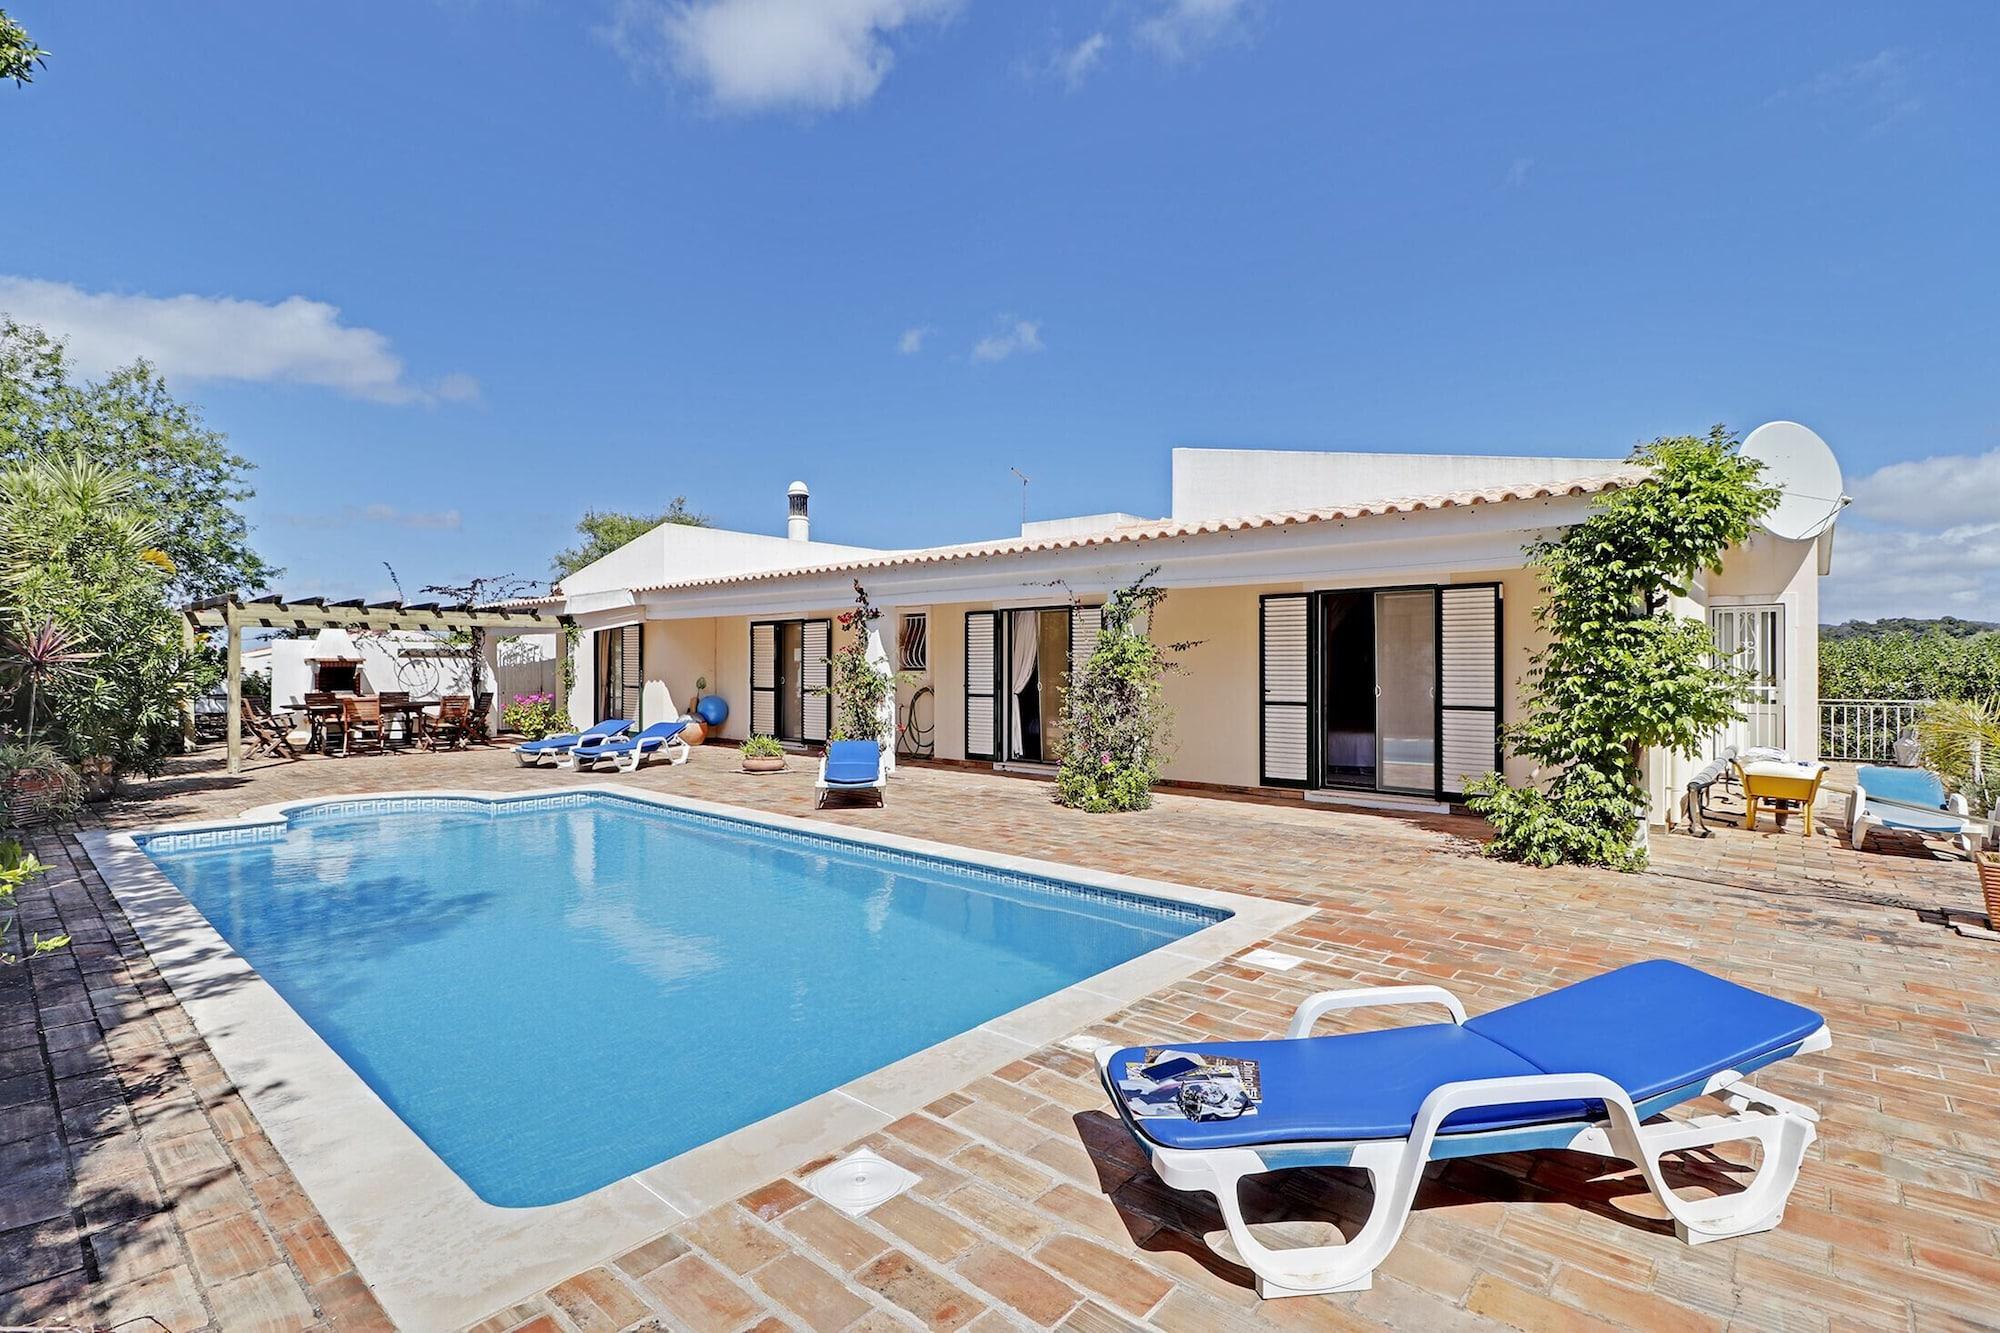 Algarve Country With Pool By Homing, São Brás de Alportel